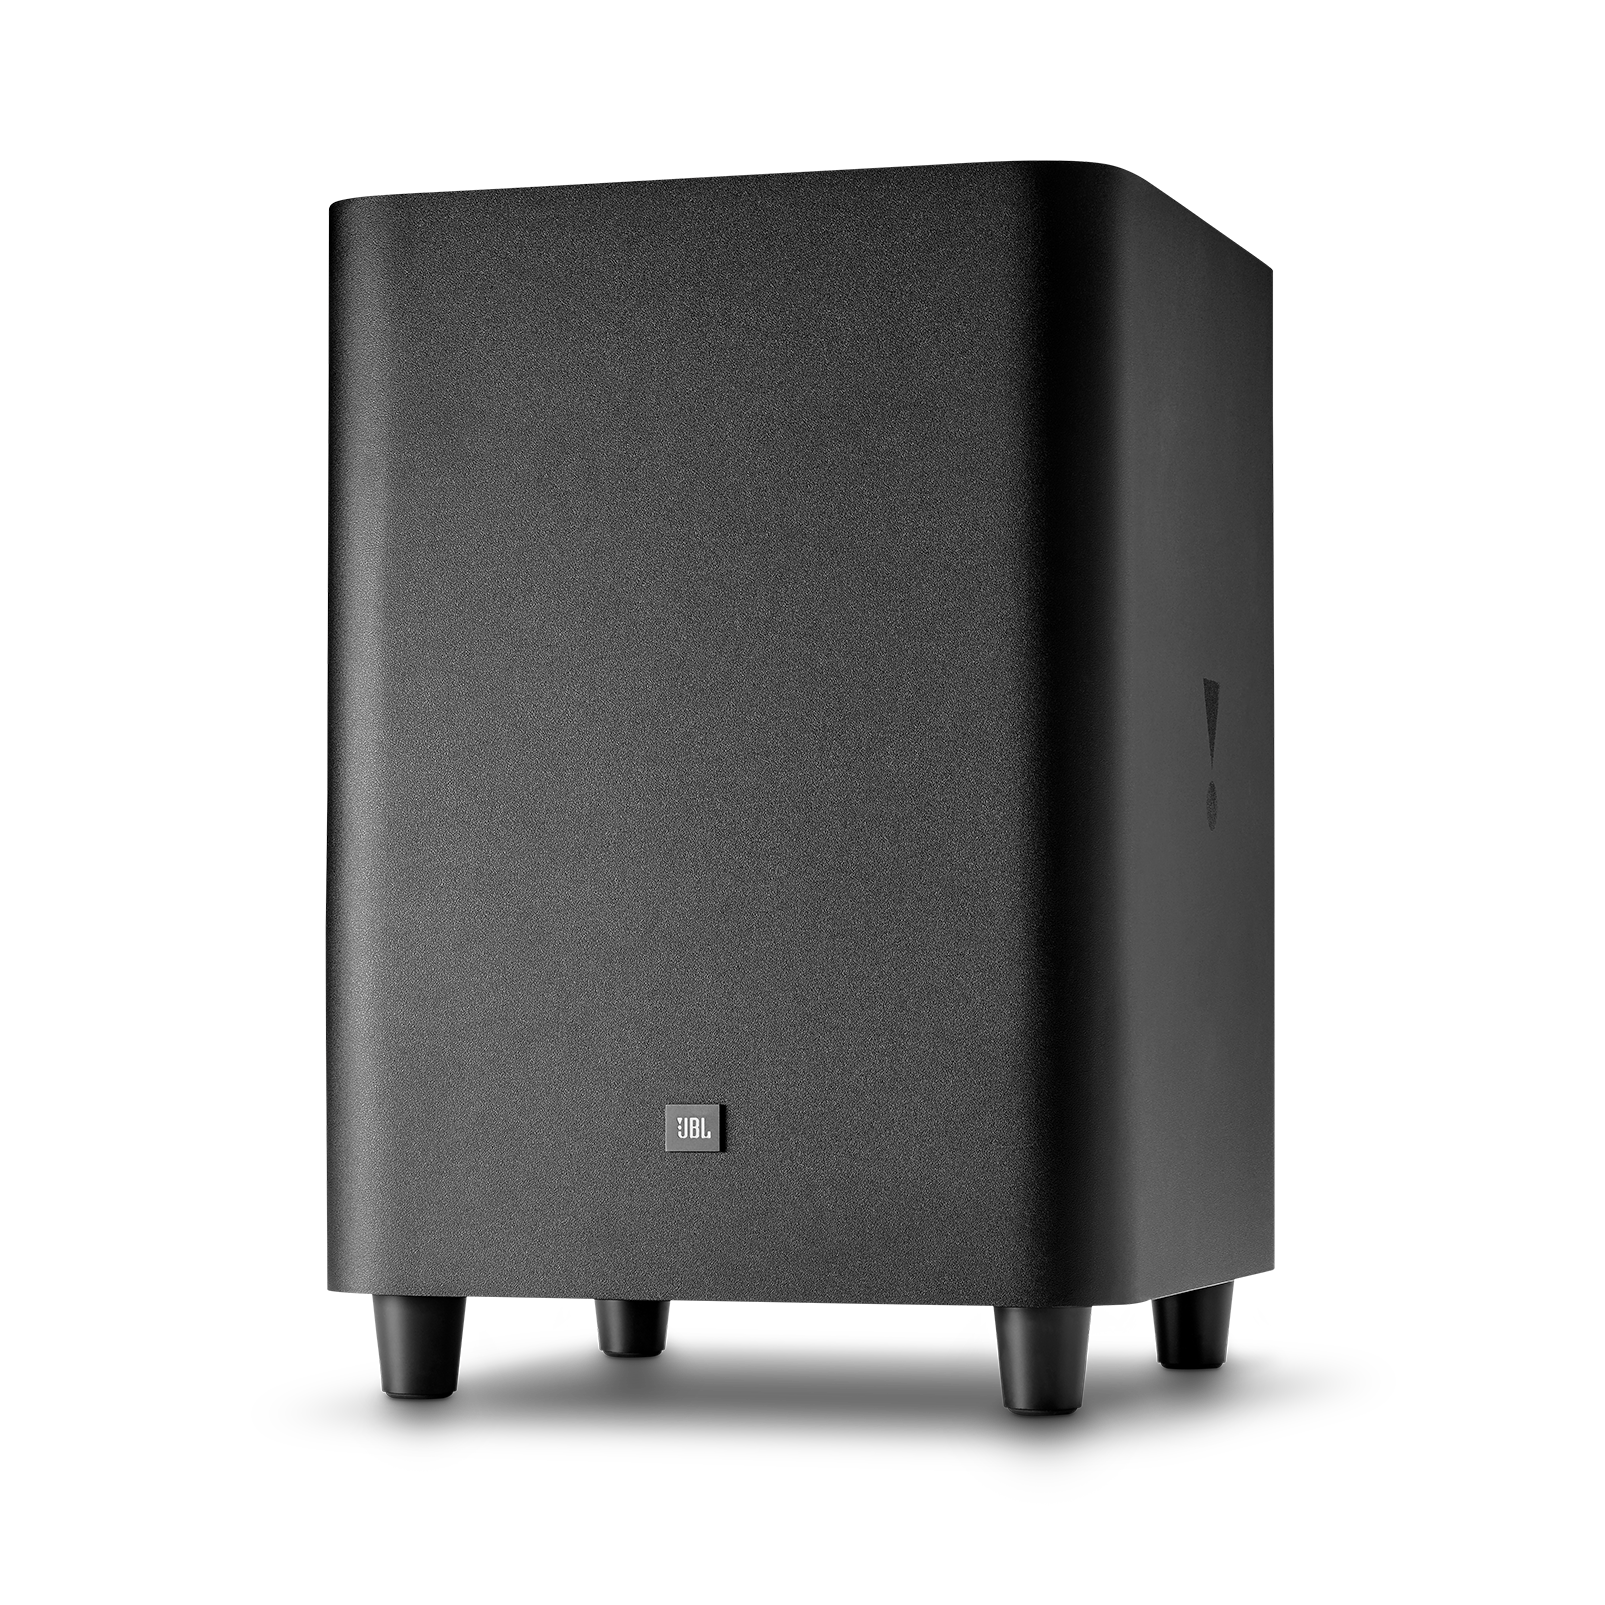 Jbl Bar Detailshot X on Jbl Car Audio Amplifiers